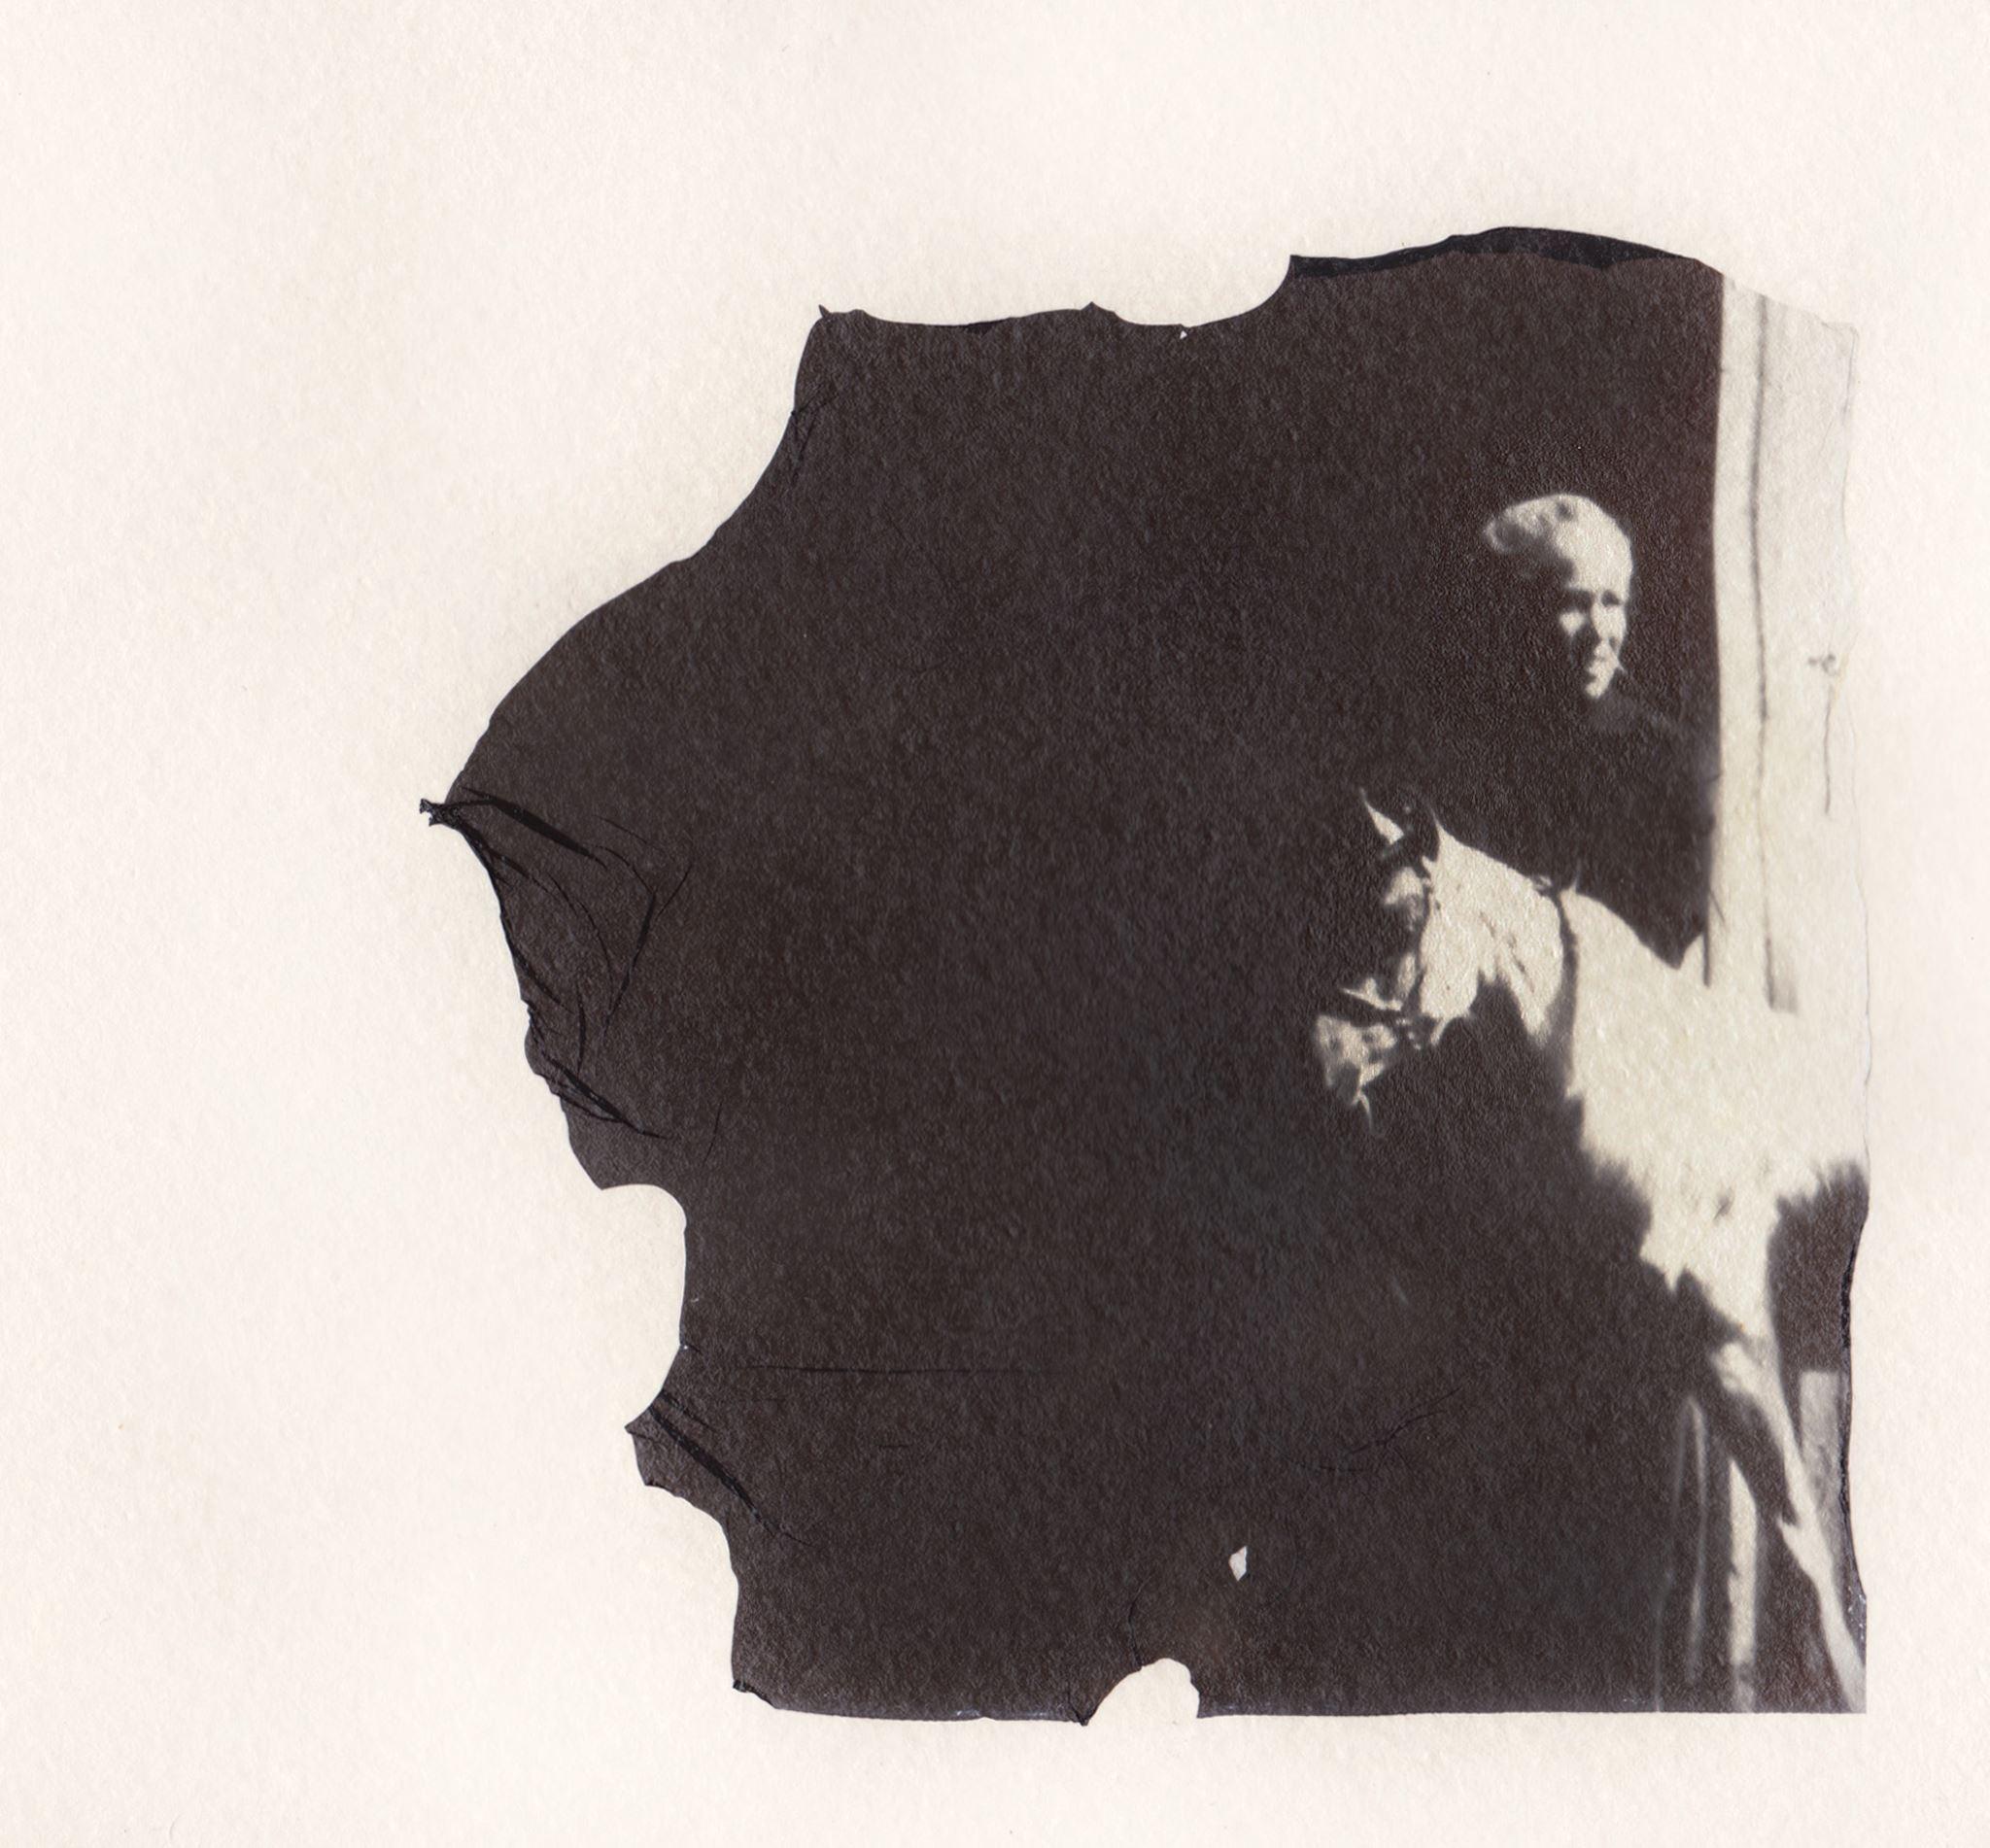 Polaroid transfer by instructor Tom Hart.